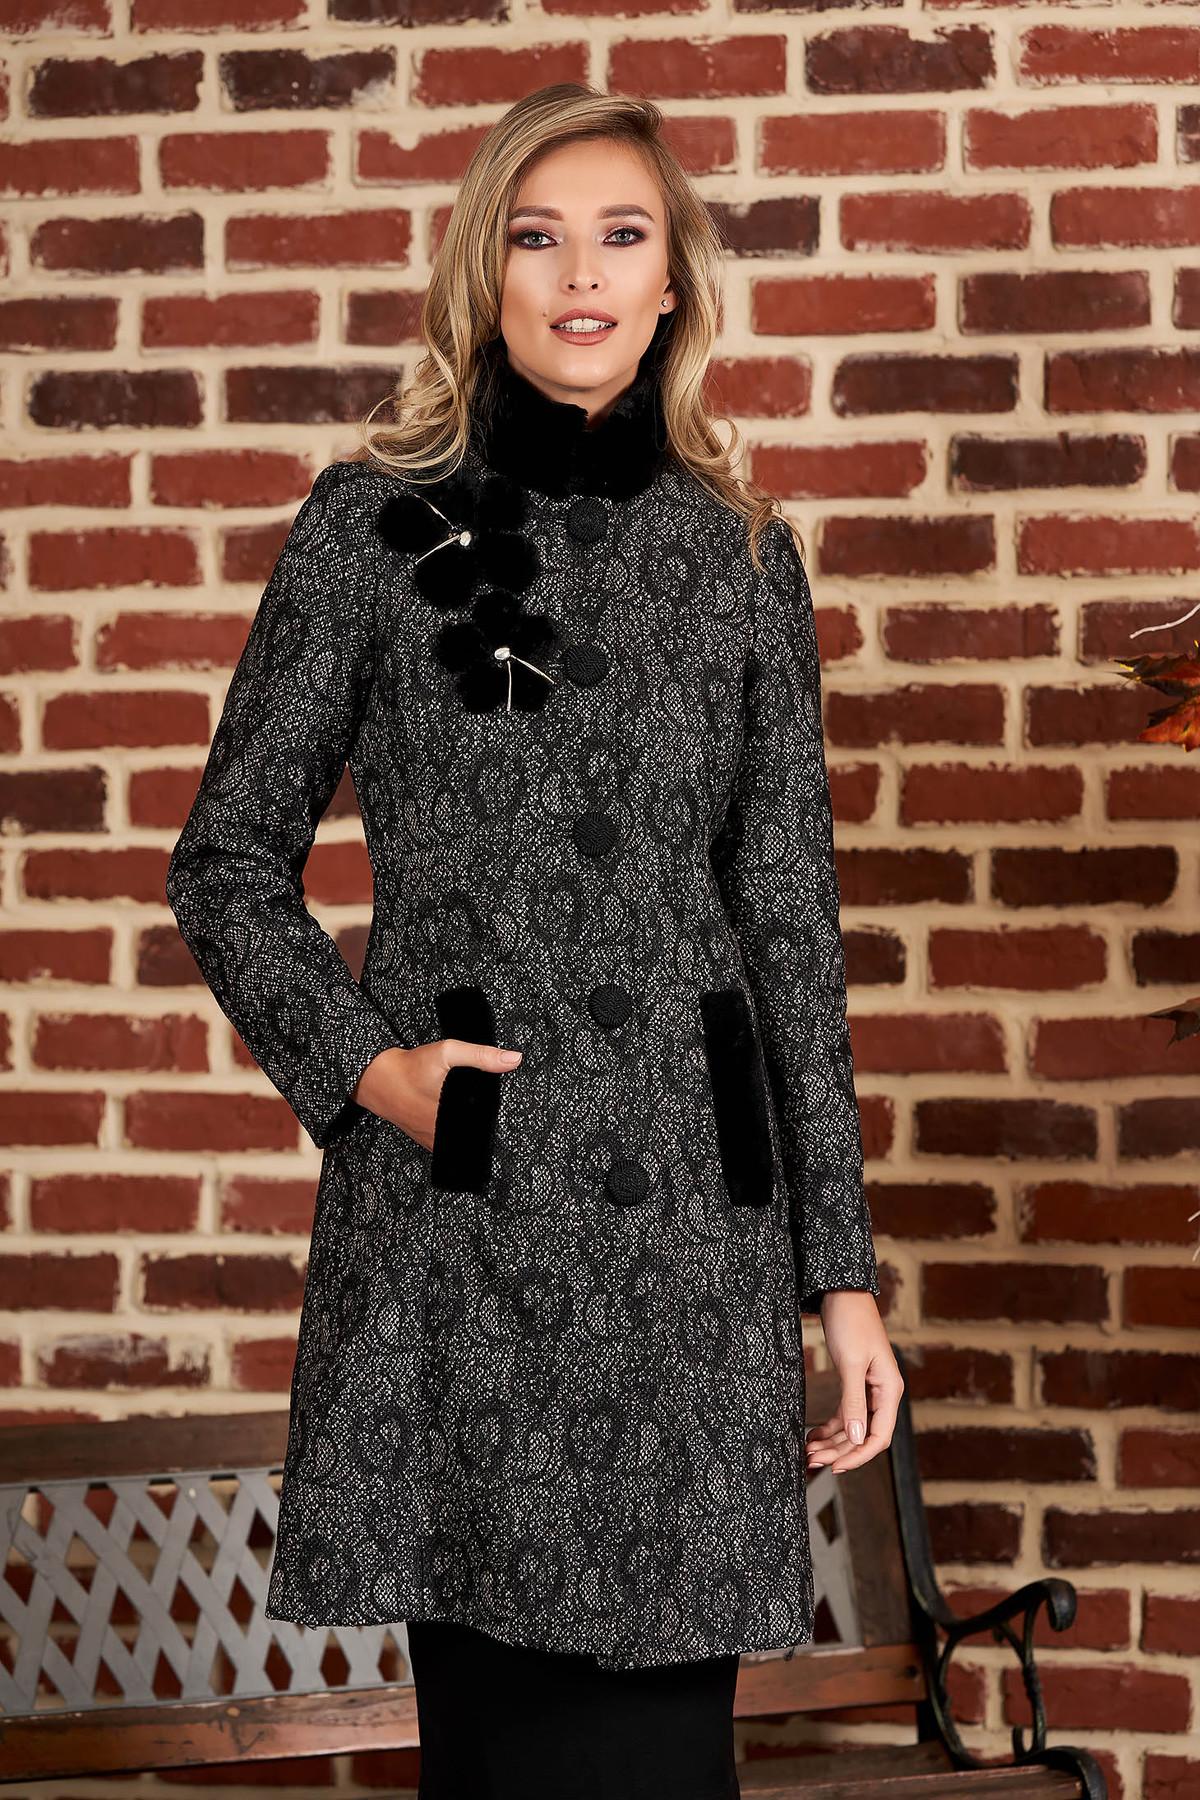 Palton LaDonna negru elegant din stofa groasa cu croi cambrat cu guler din blana si aplicatii florale